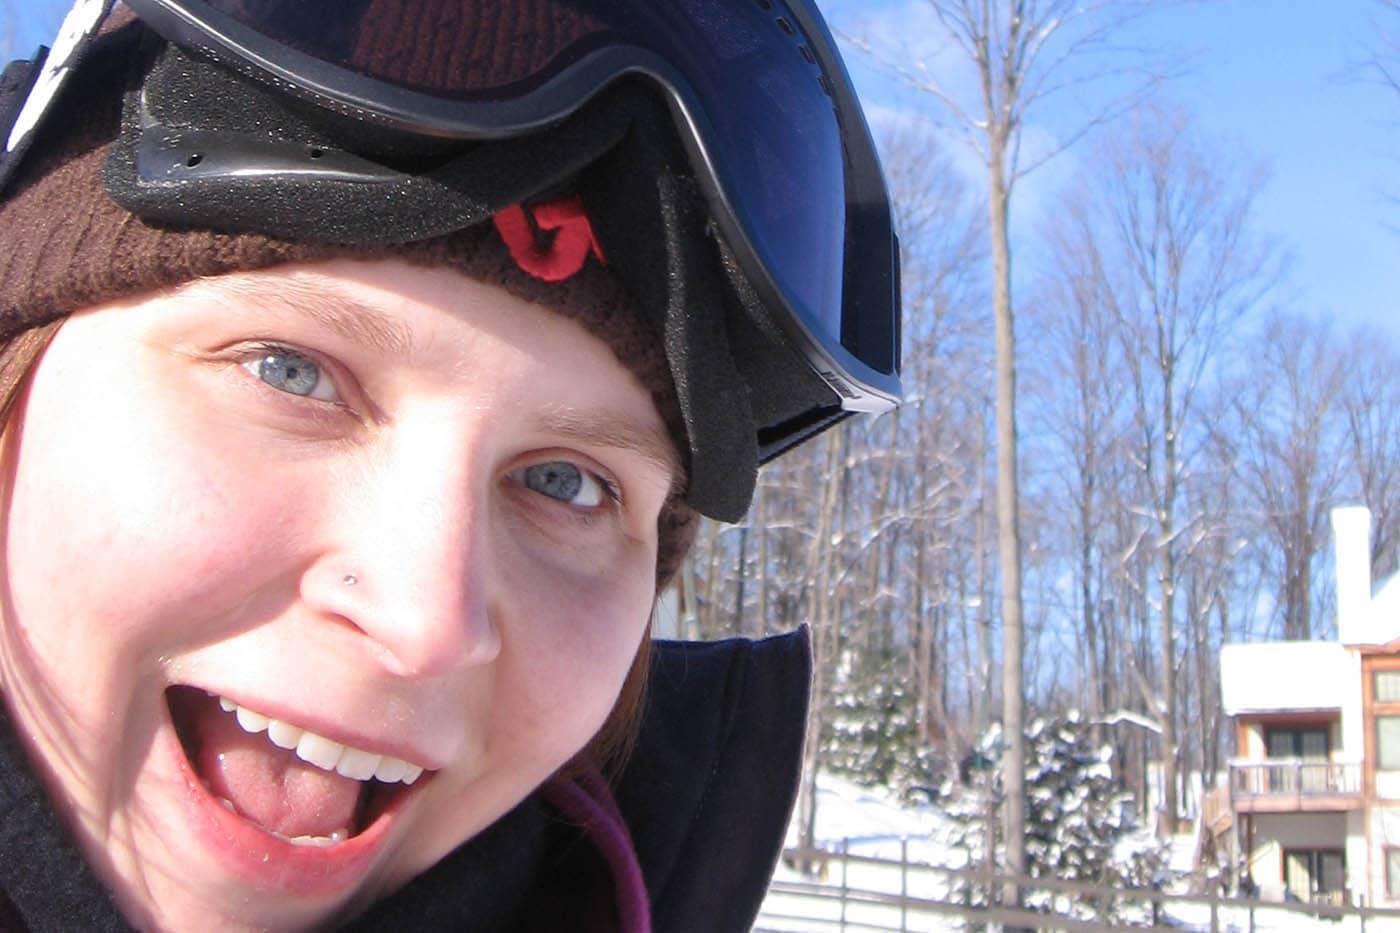 My first ski trip in Petoskey, Michigan